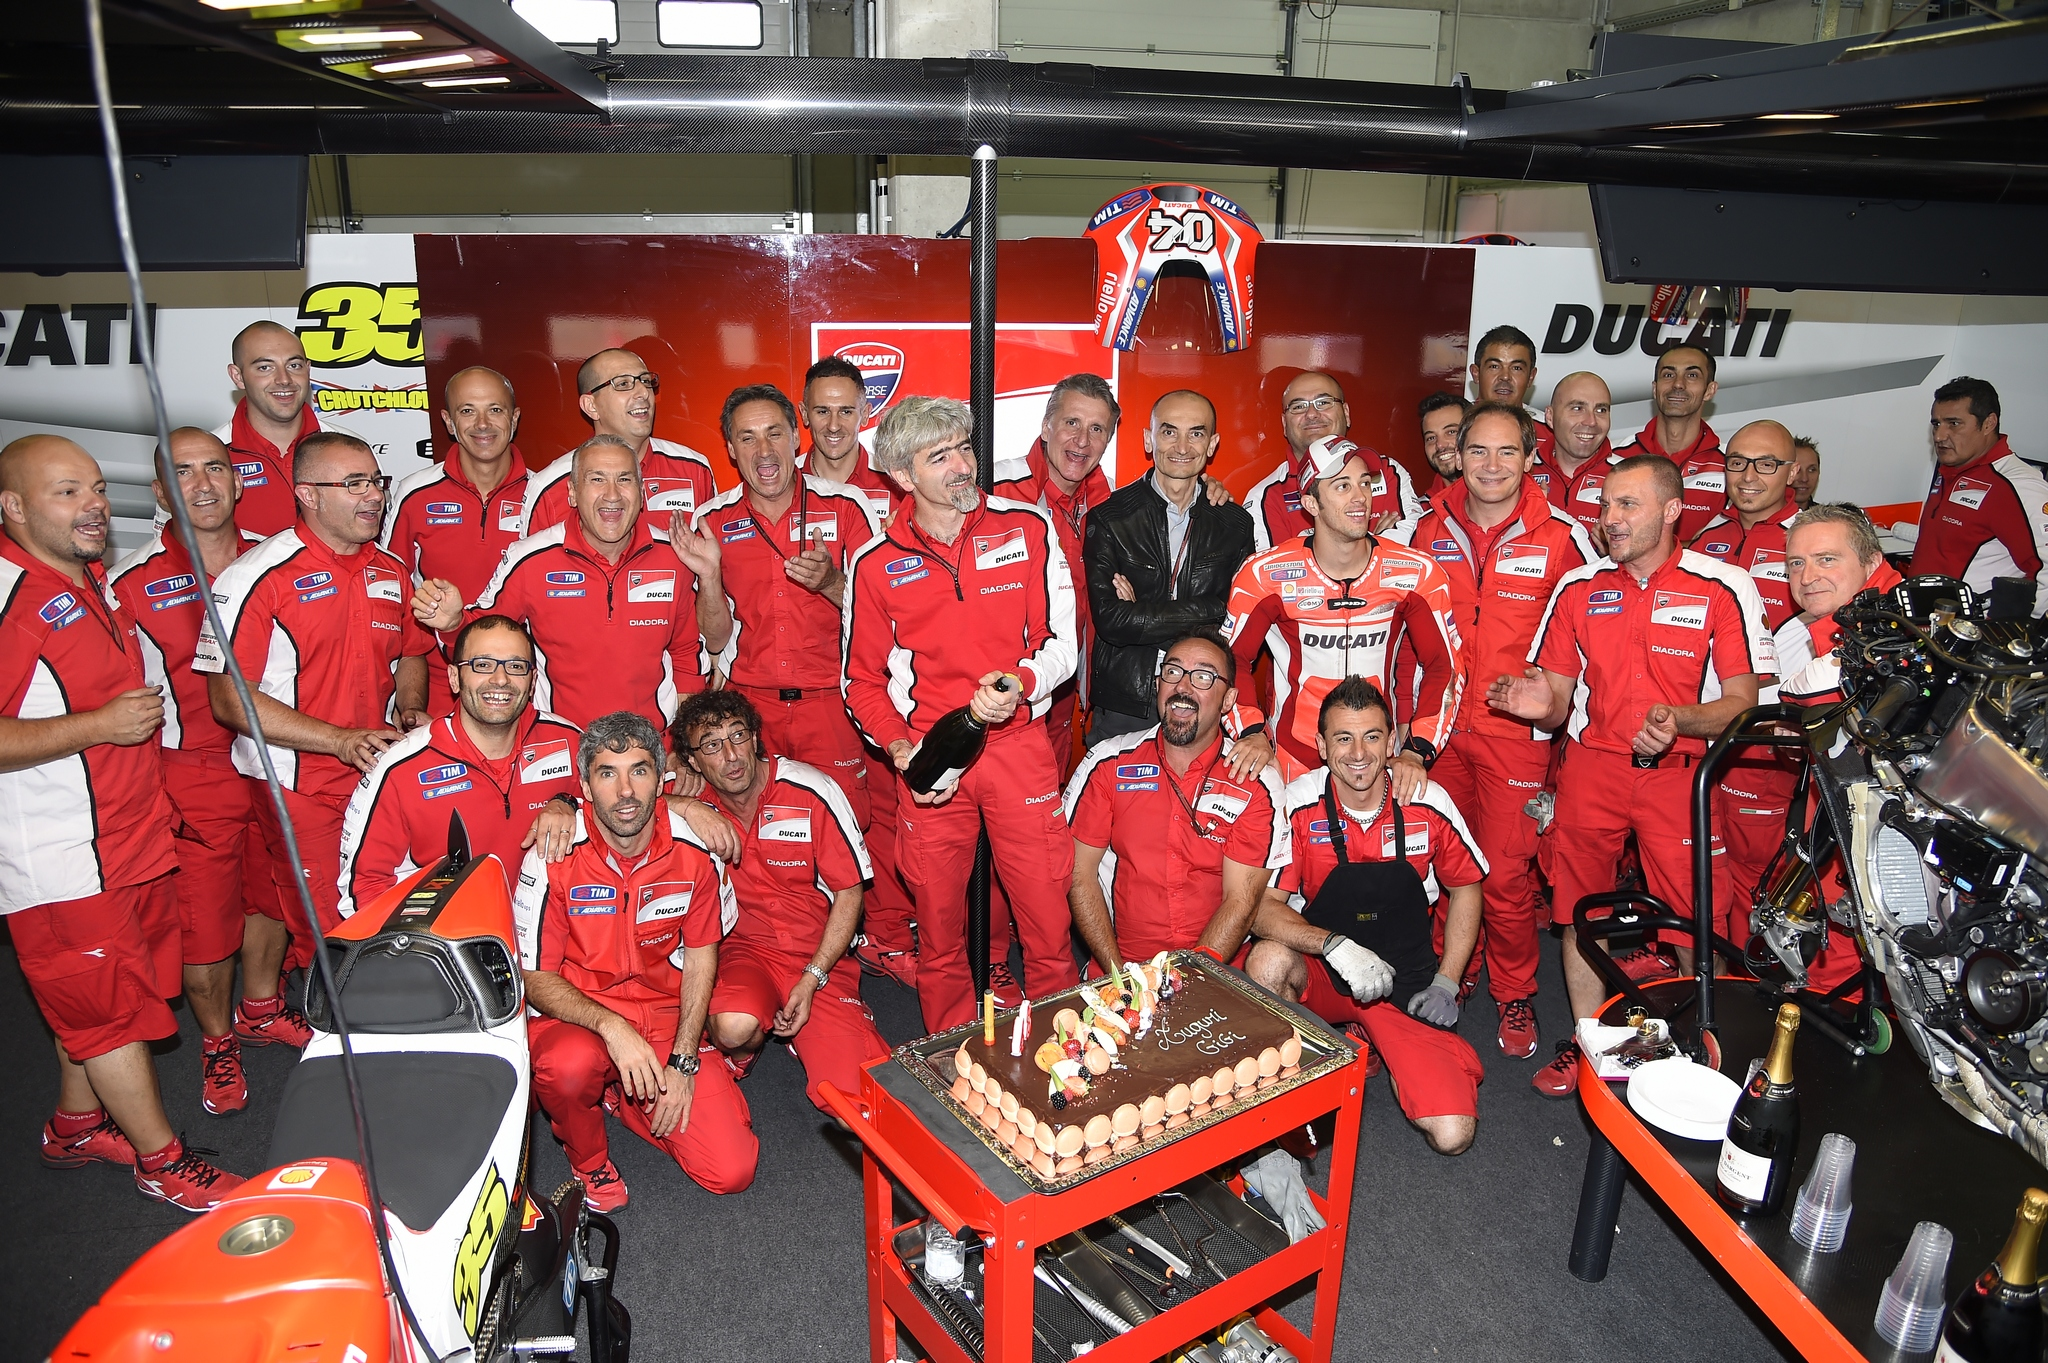 Dovizioso, Crutchlow, Iannone at Ducati, Hope for Much Better New MotoGP Bike - autoevolution